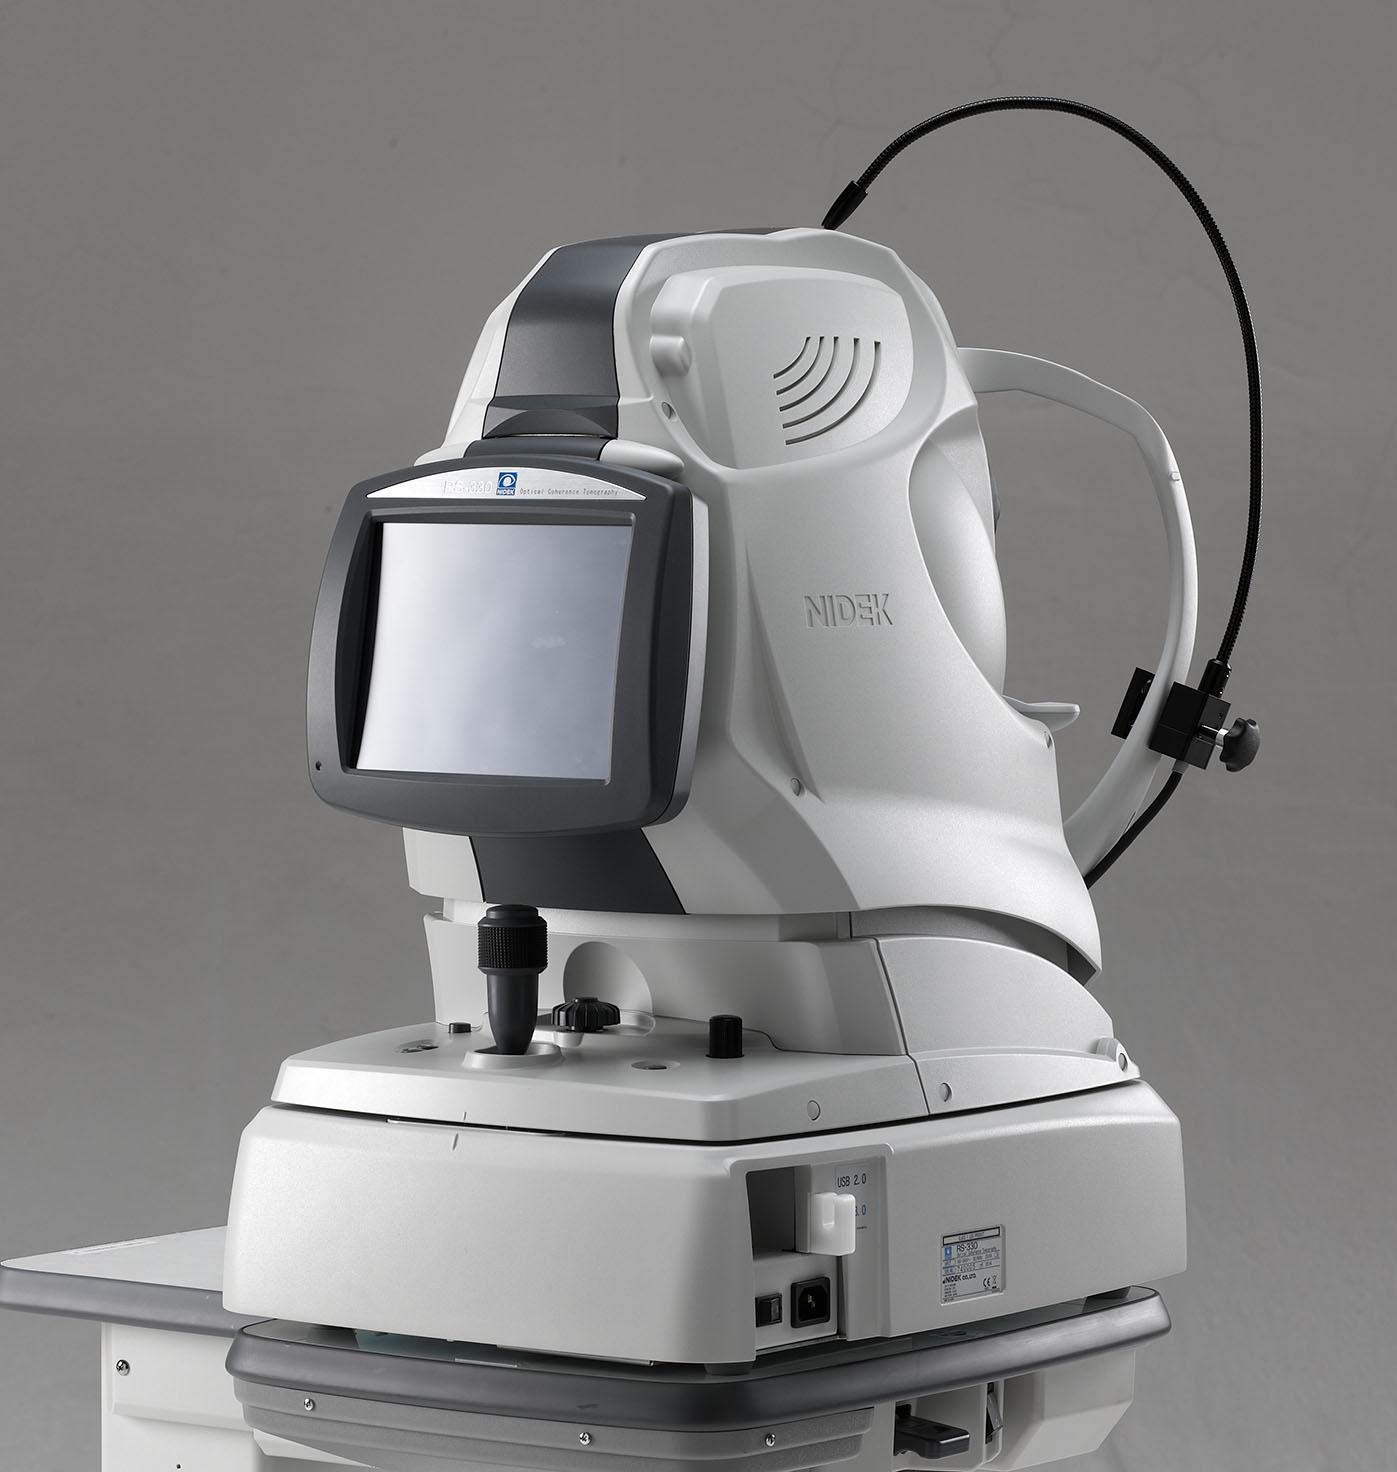 https://www.lameris-group.nl/wp-content/uploads/2020/03/Nidek-Optical-Coherence-Tomography-Retina-Scan-Duo-RS-330.jpg